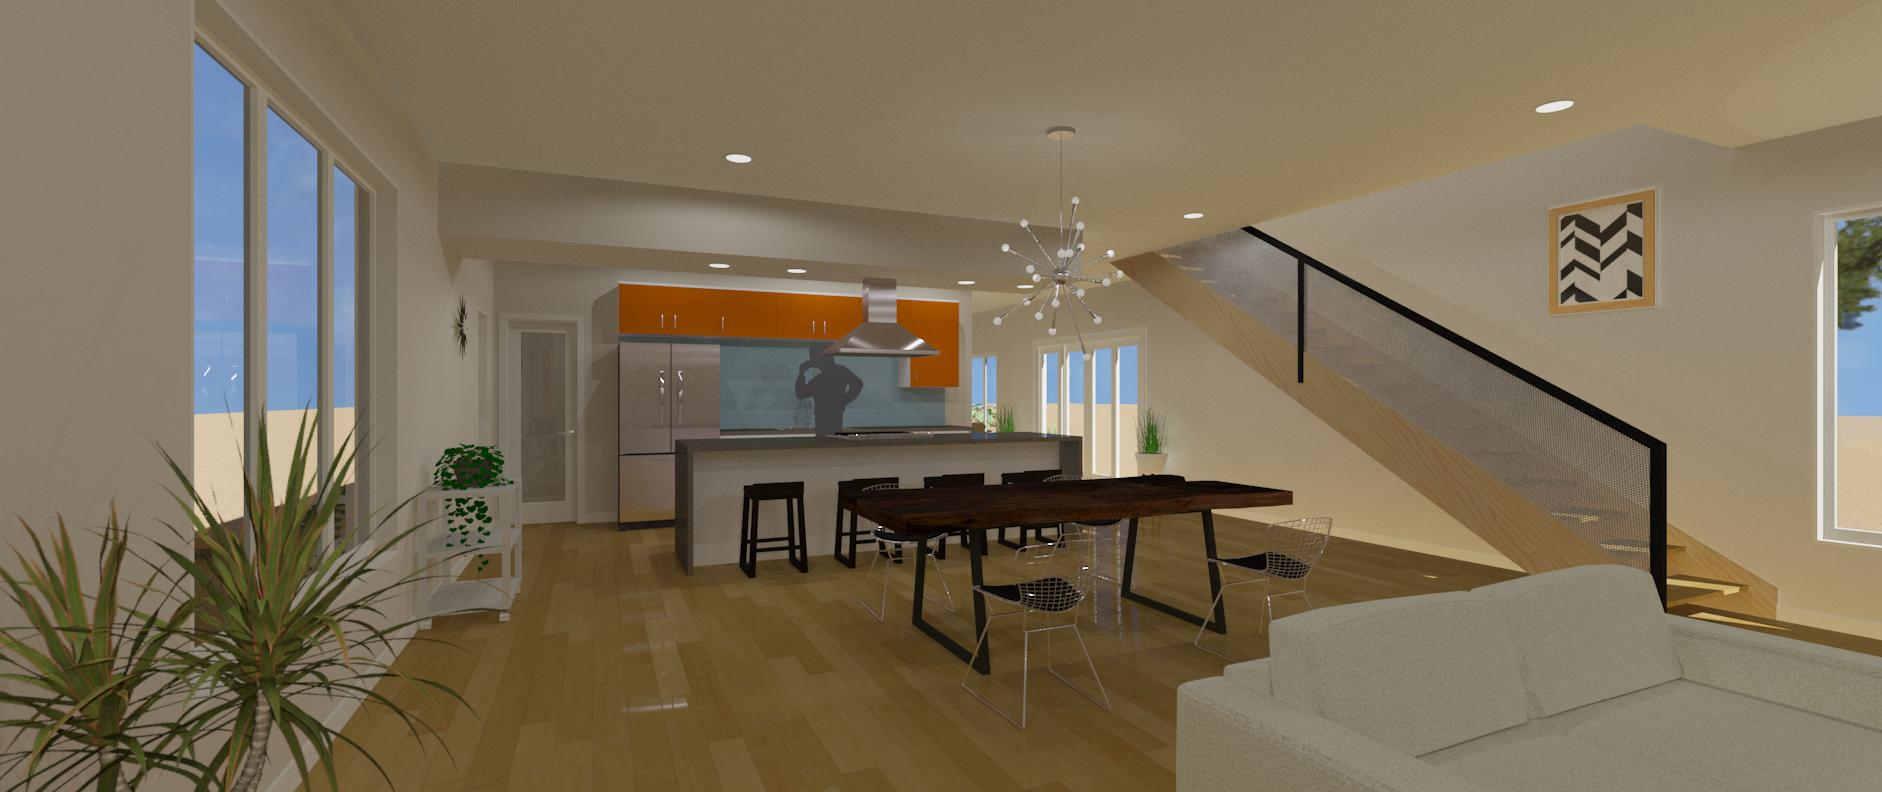 modern kitchen remodeling in scottsdale